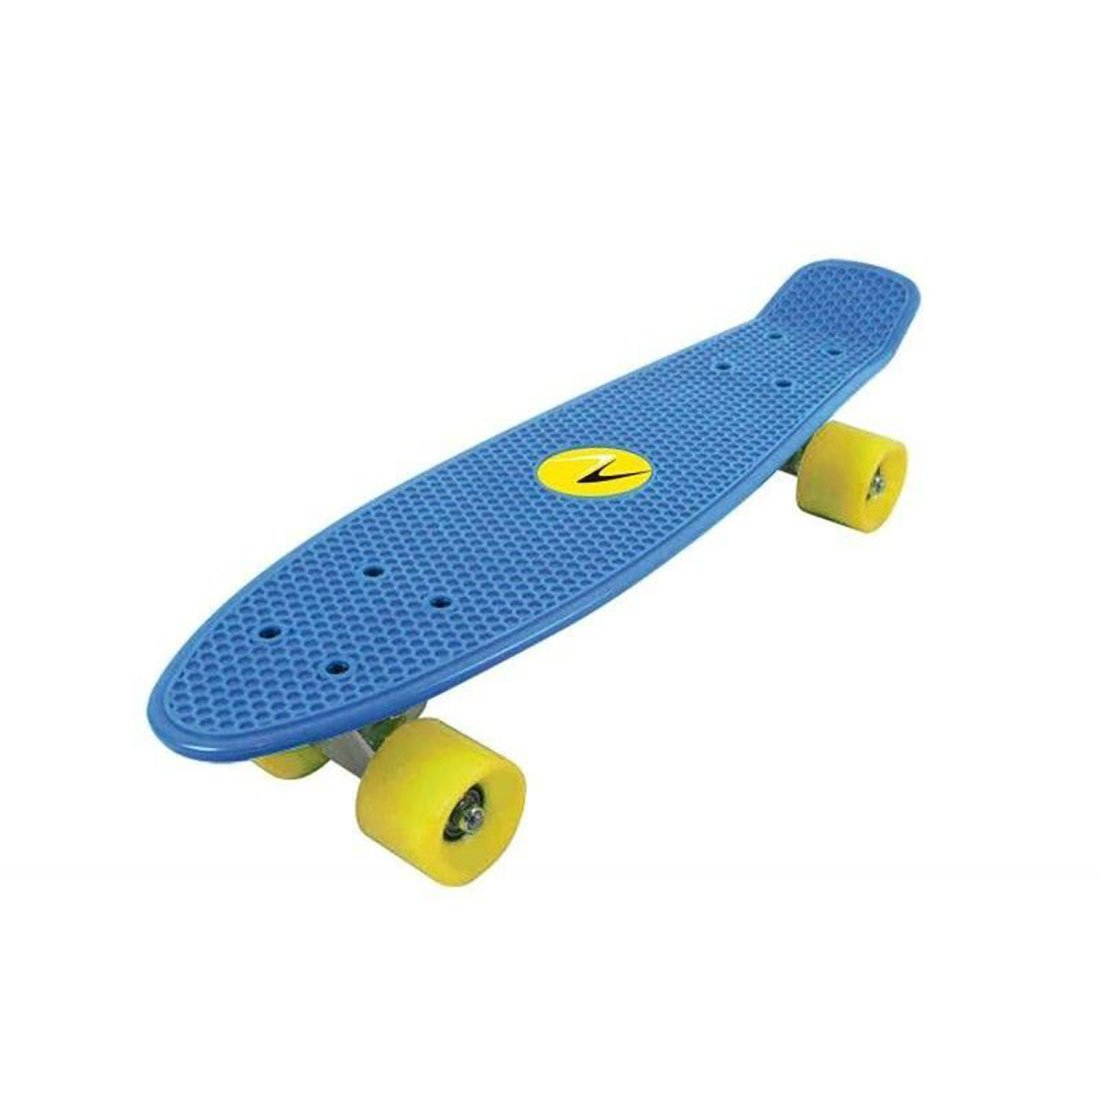 Skateboard penny board DHS Nextreme Freedom, albastru imagine